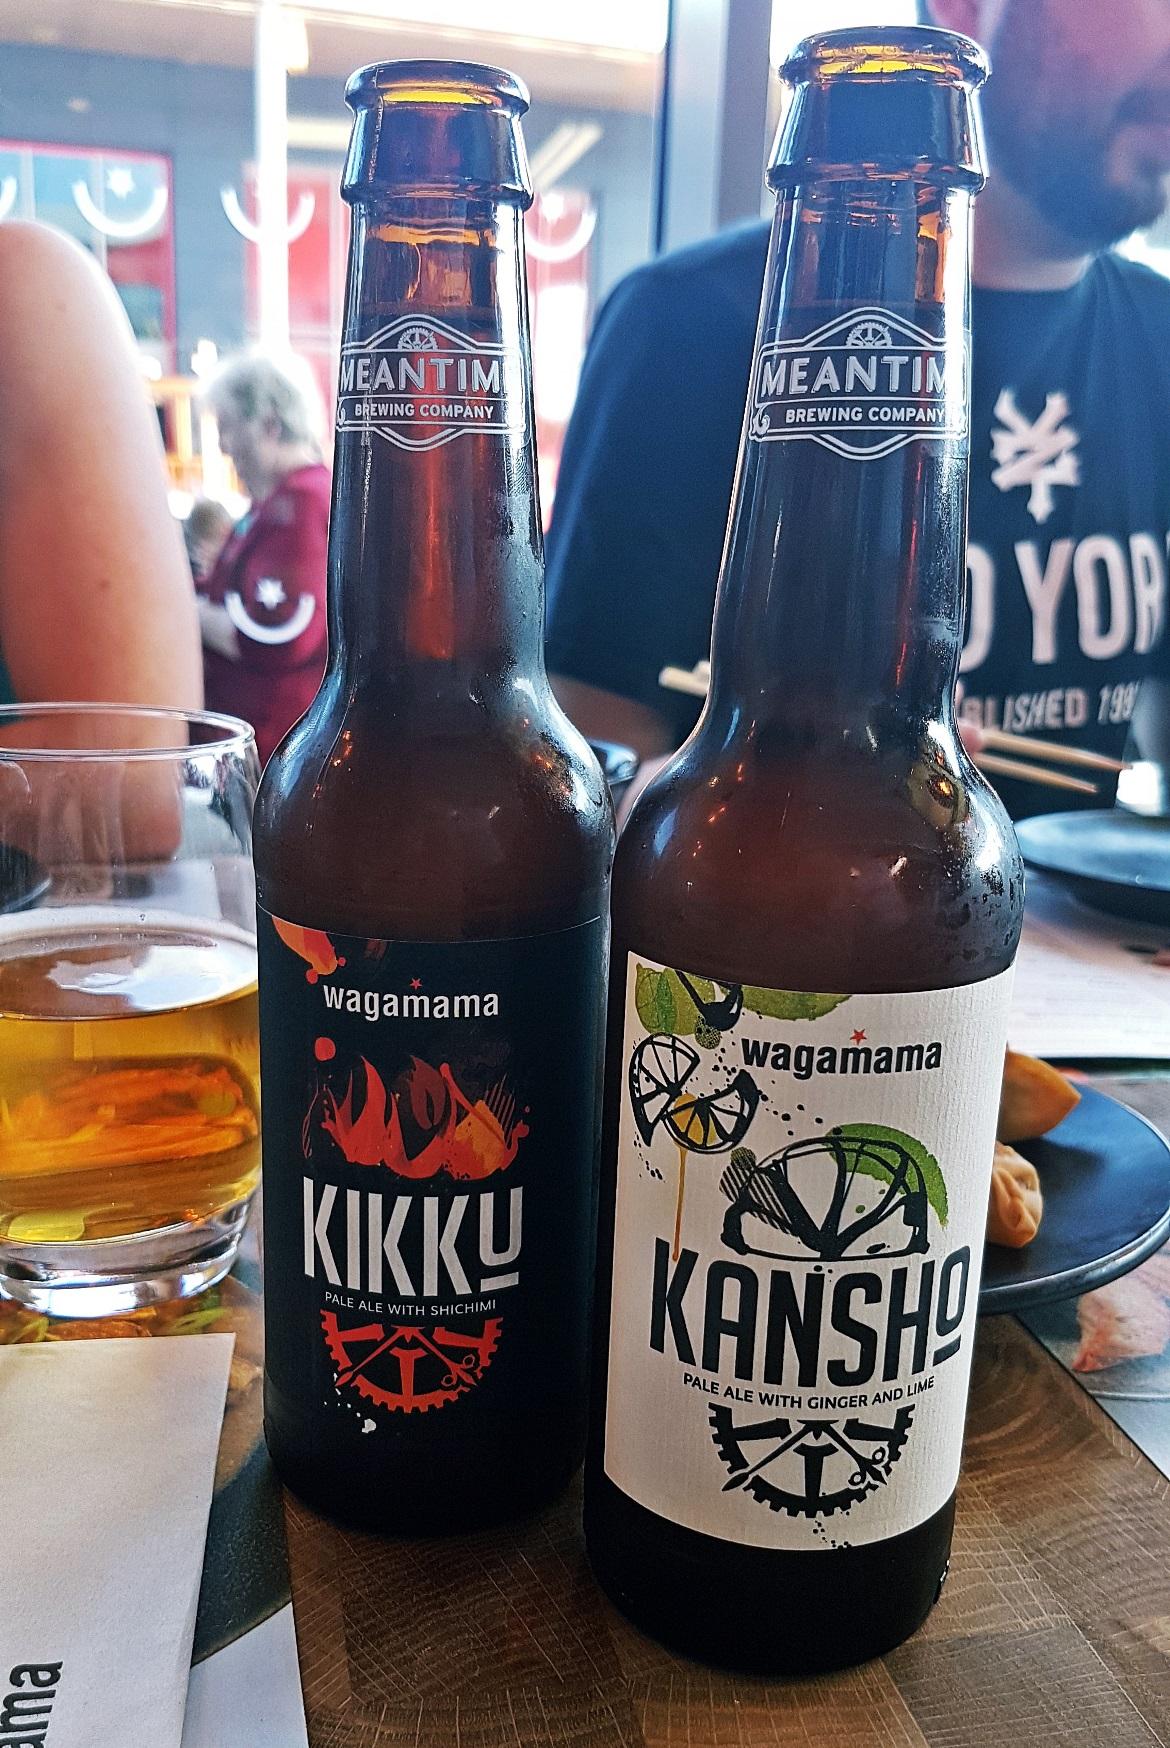 Kikku and Kansho beers - Wagamama Menu Pairing, Review by BeckyBecky Blogs